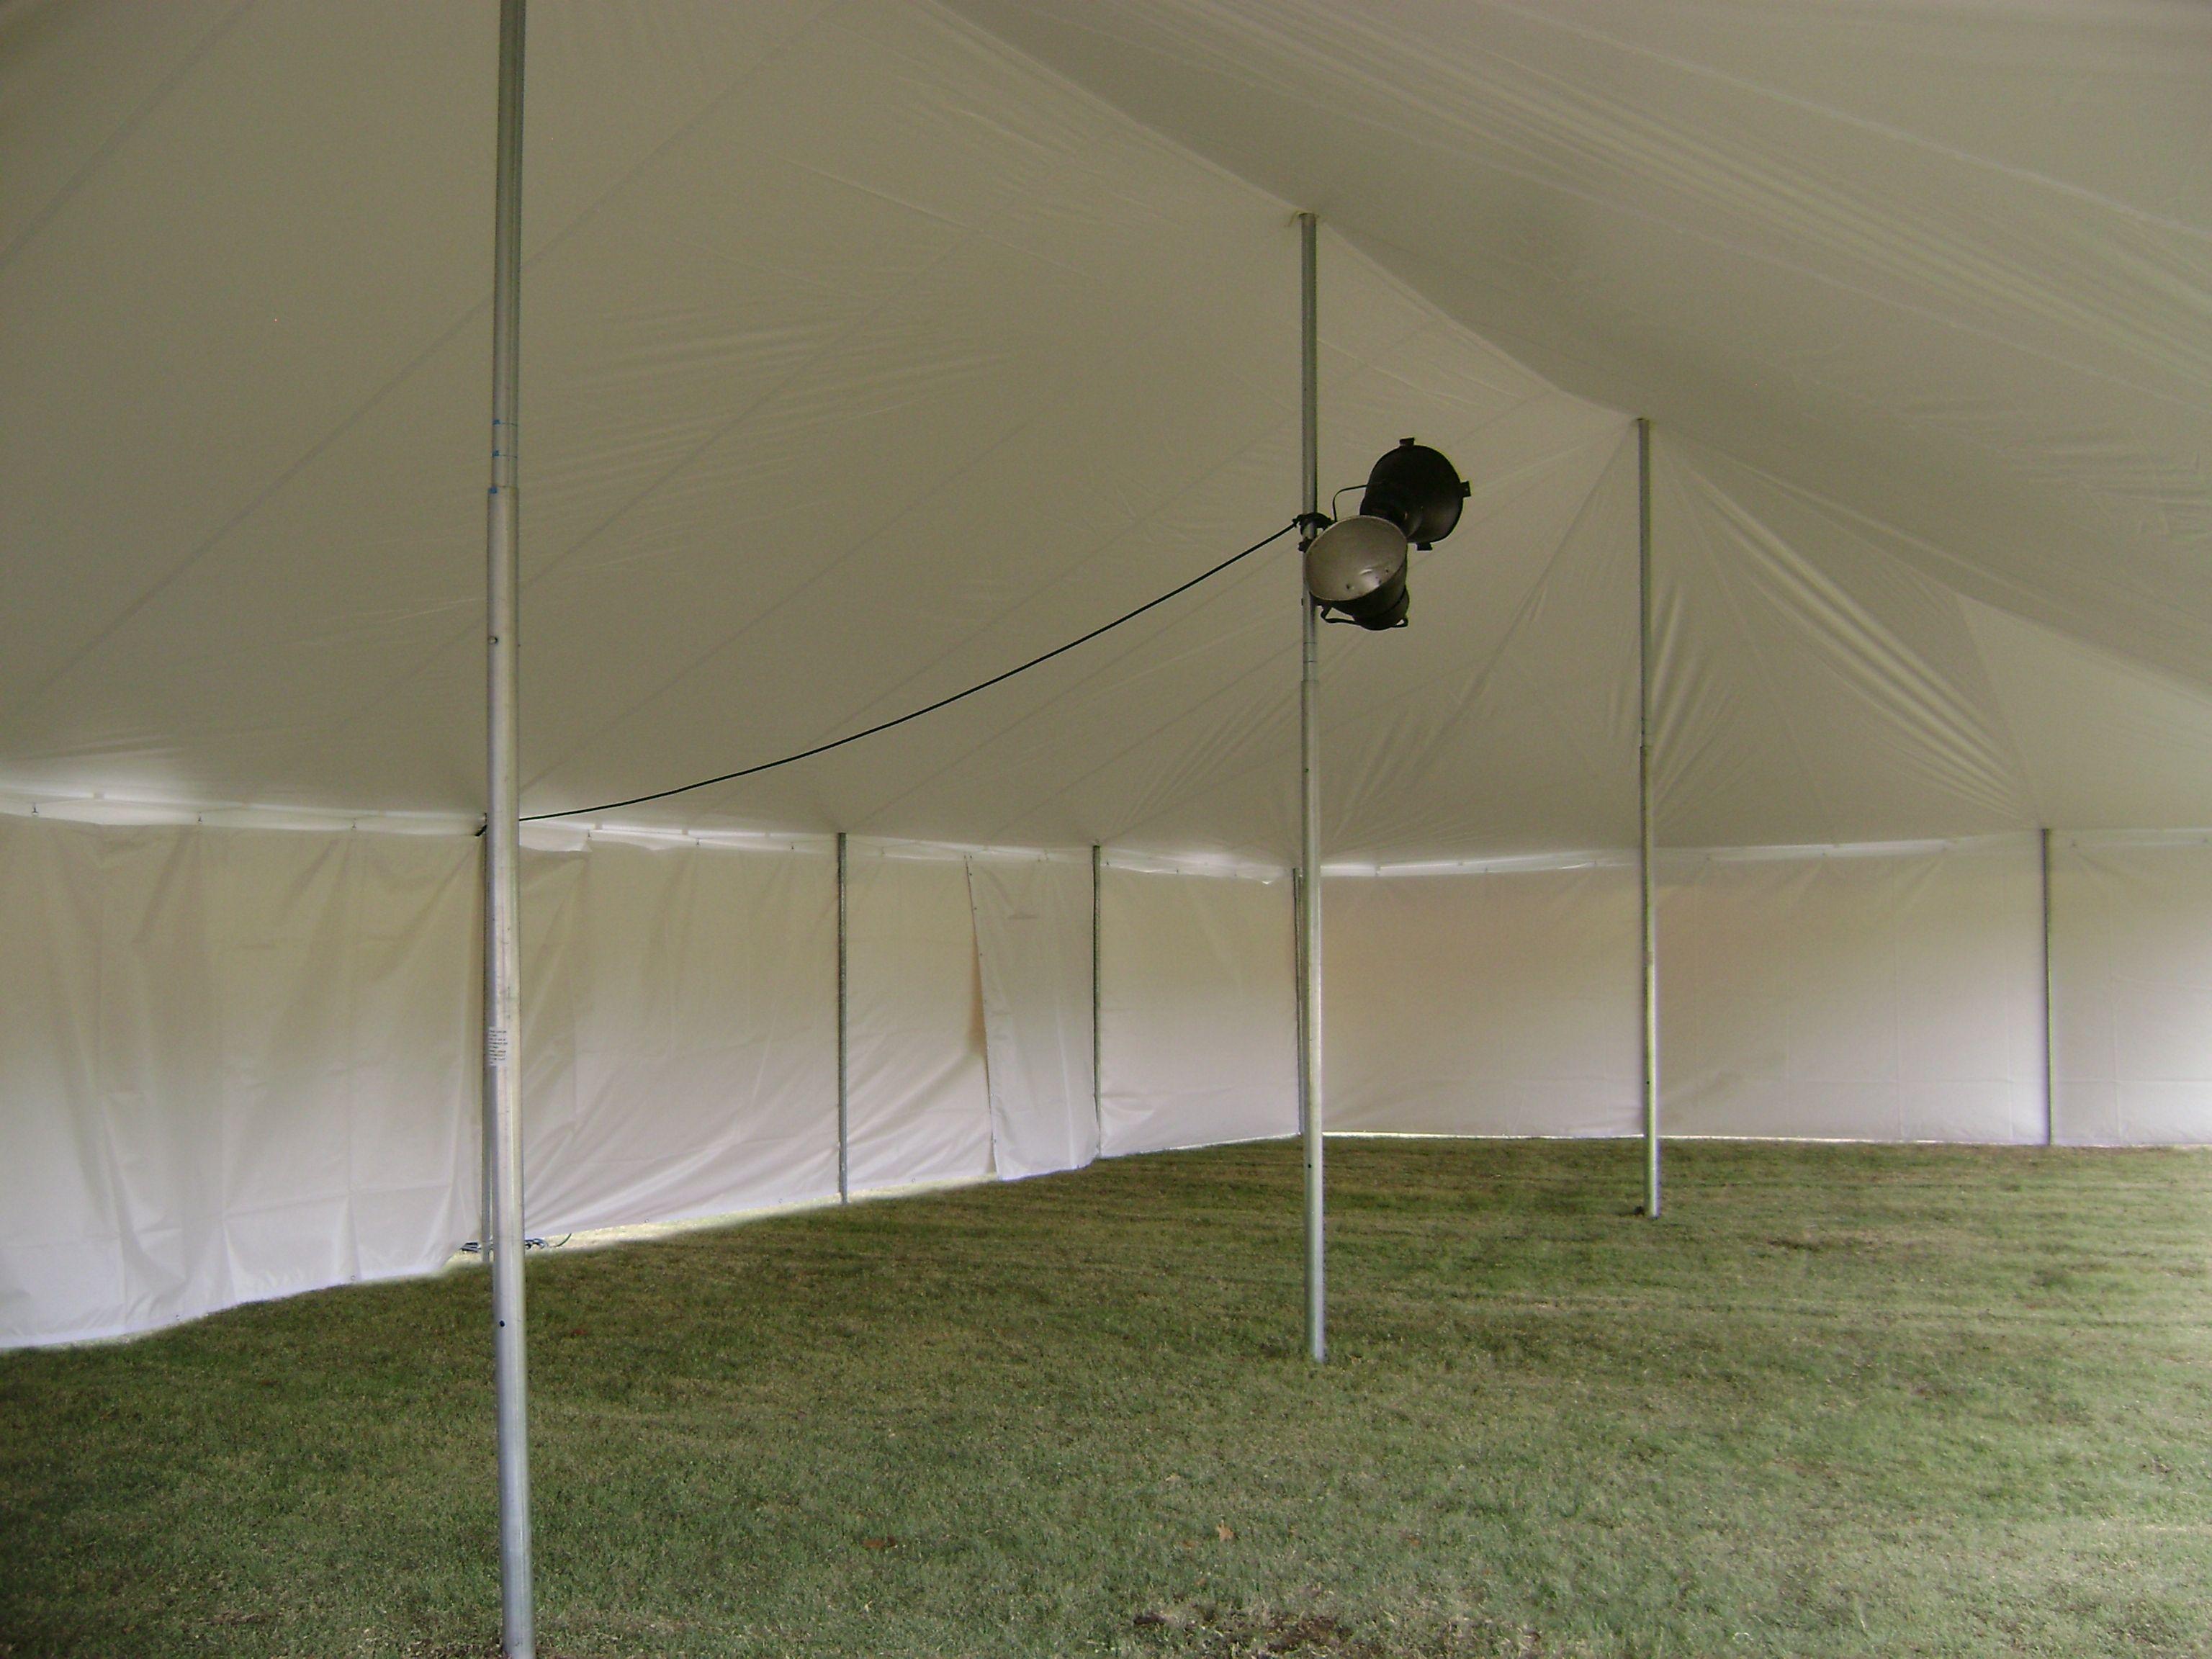 Vinyl tent. 30u0027 x 60u0027 rectangle pole ... & Vinyl tent. 30u0027 x 60u0027 rectangle pole tent. | Vinyl tents for your ...